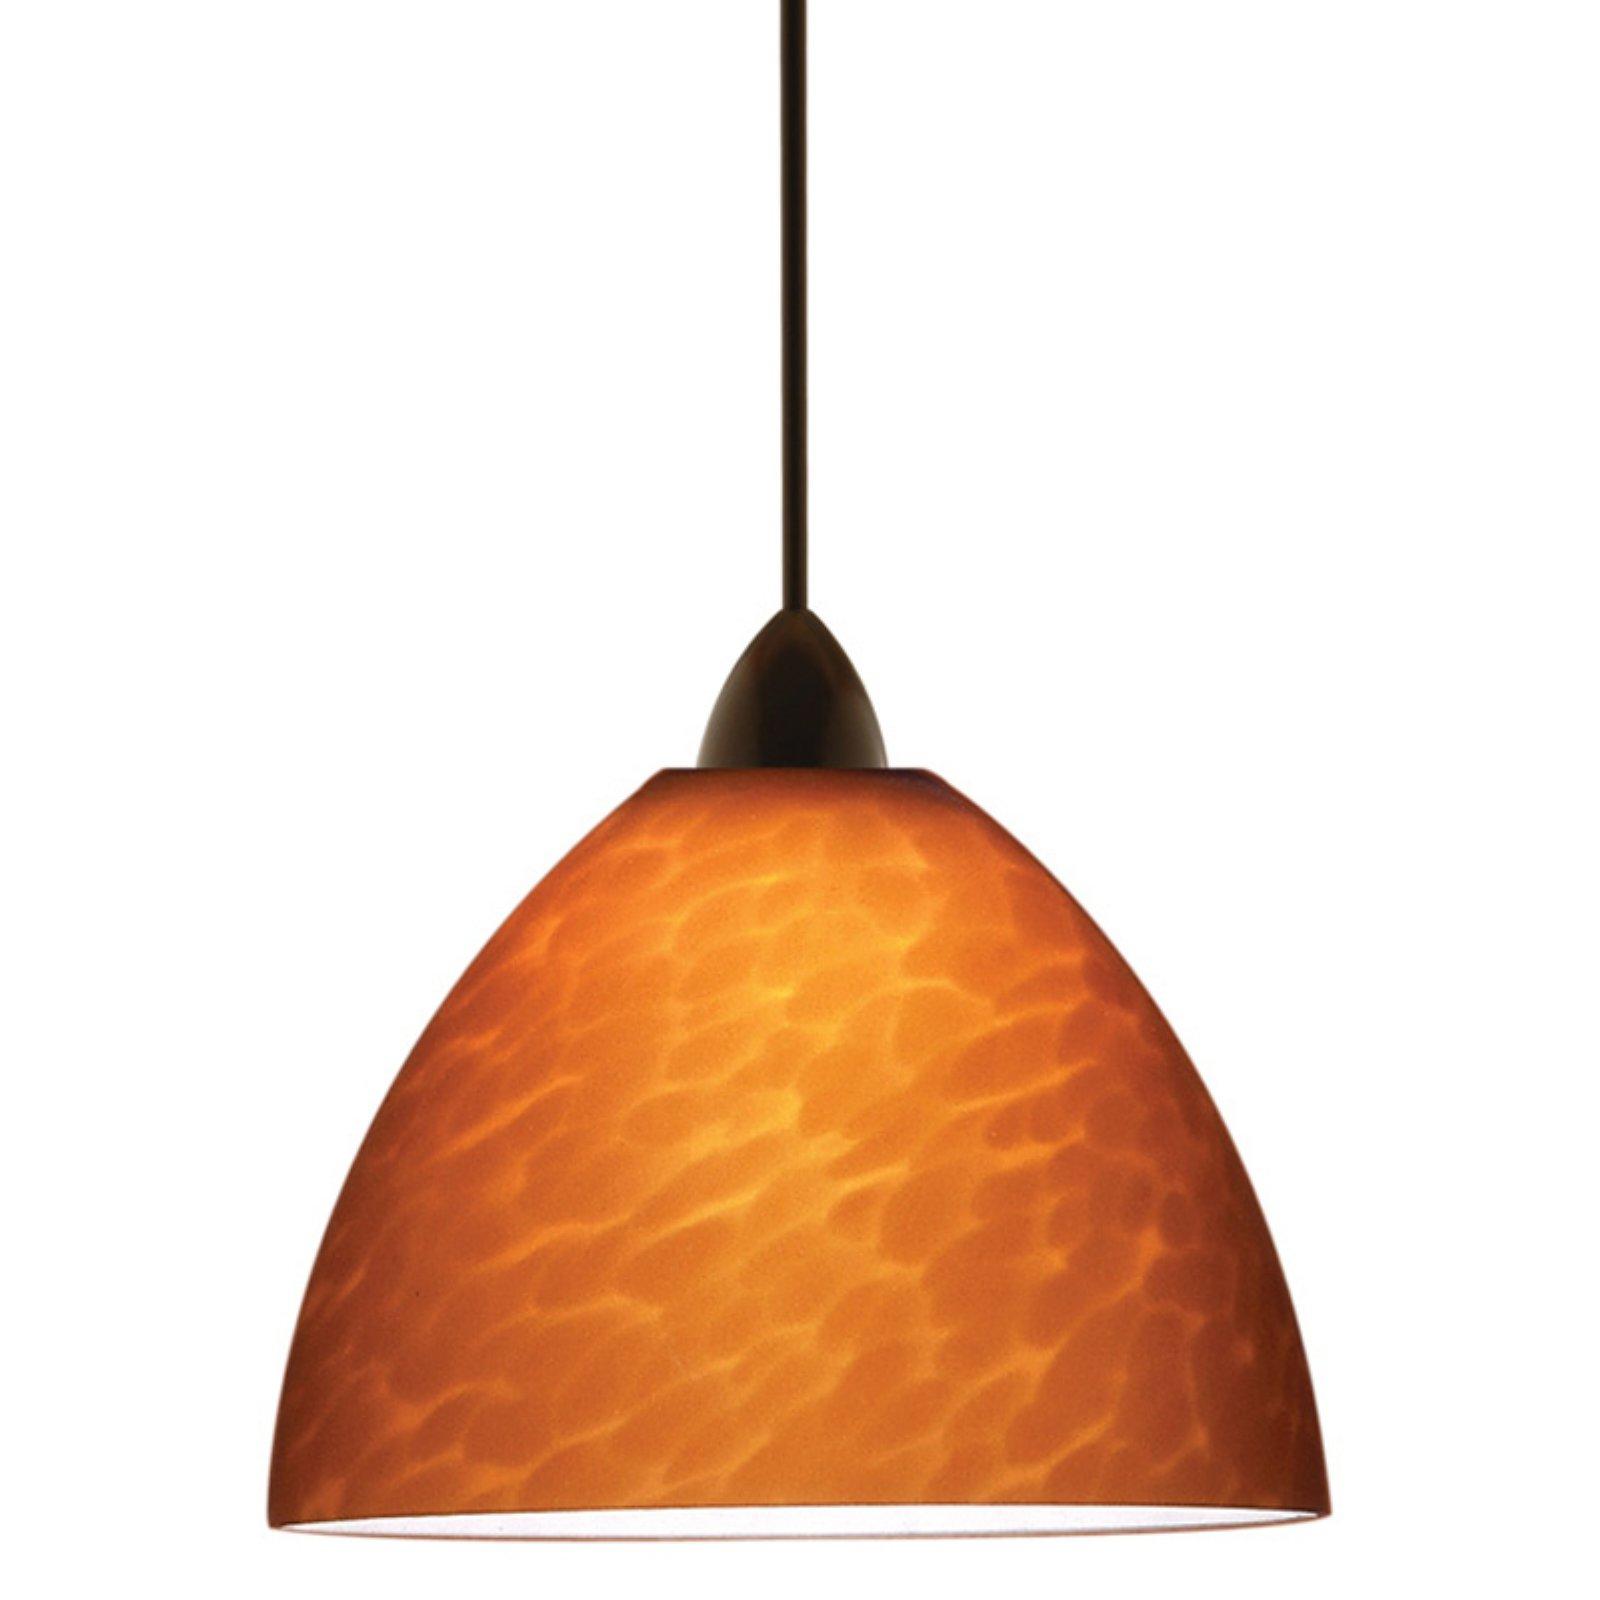 2019 Wac Lighting Faberge Mp 541 Pendant Light (View 2 of 20)